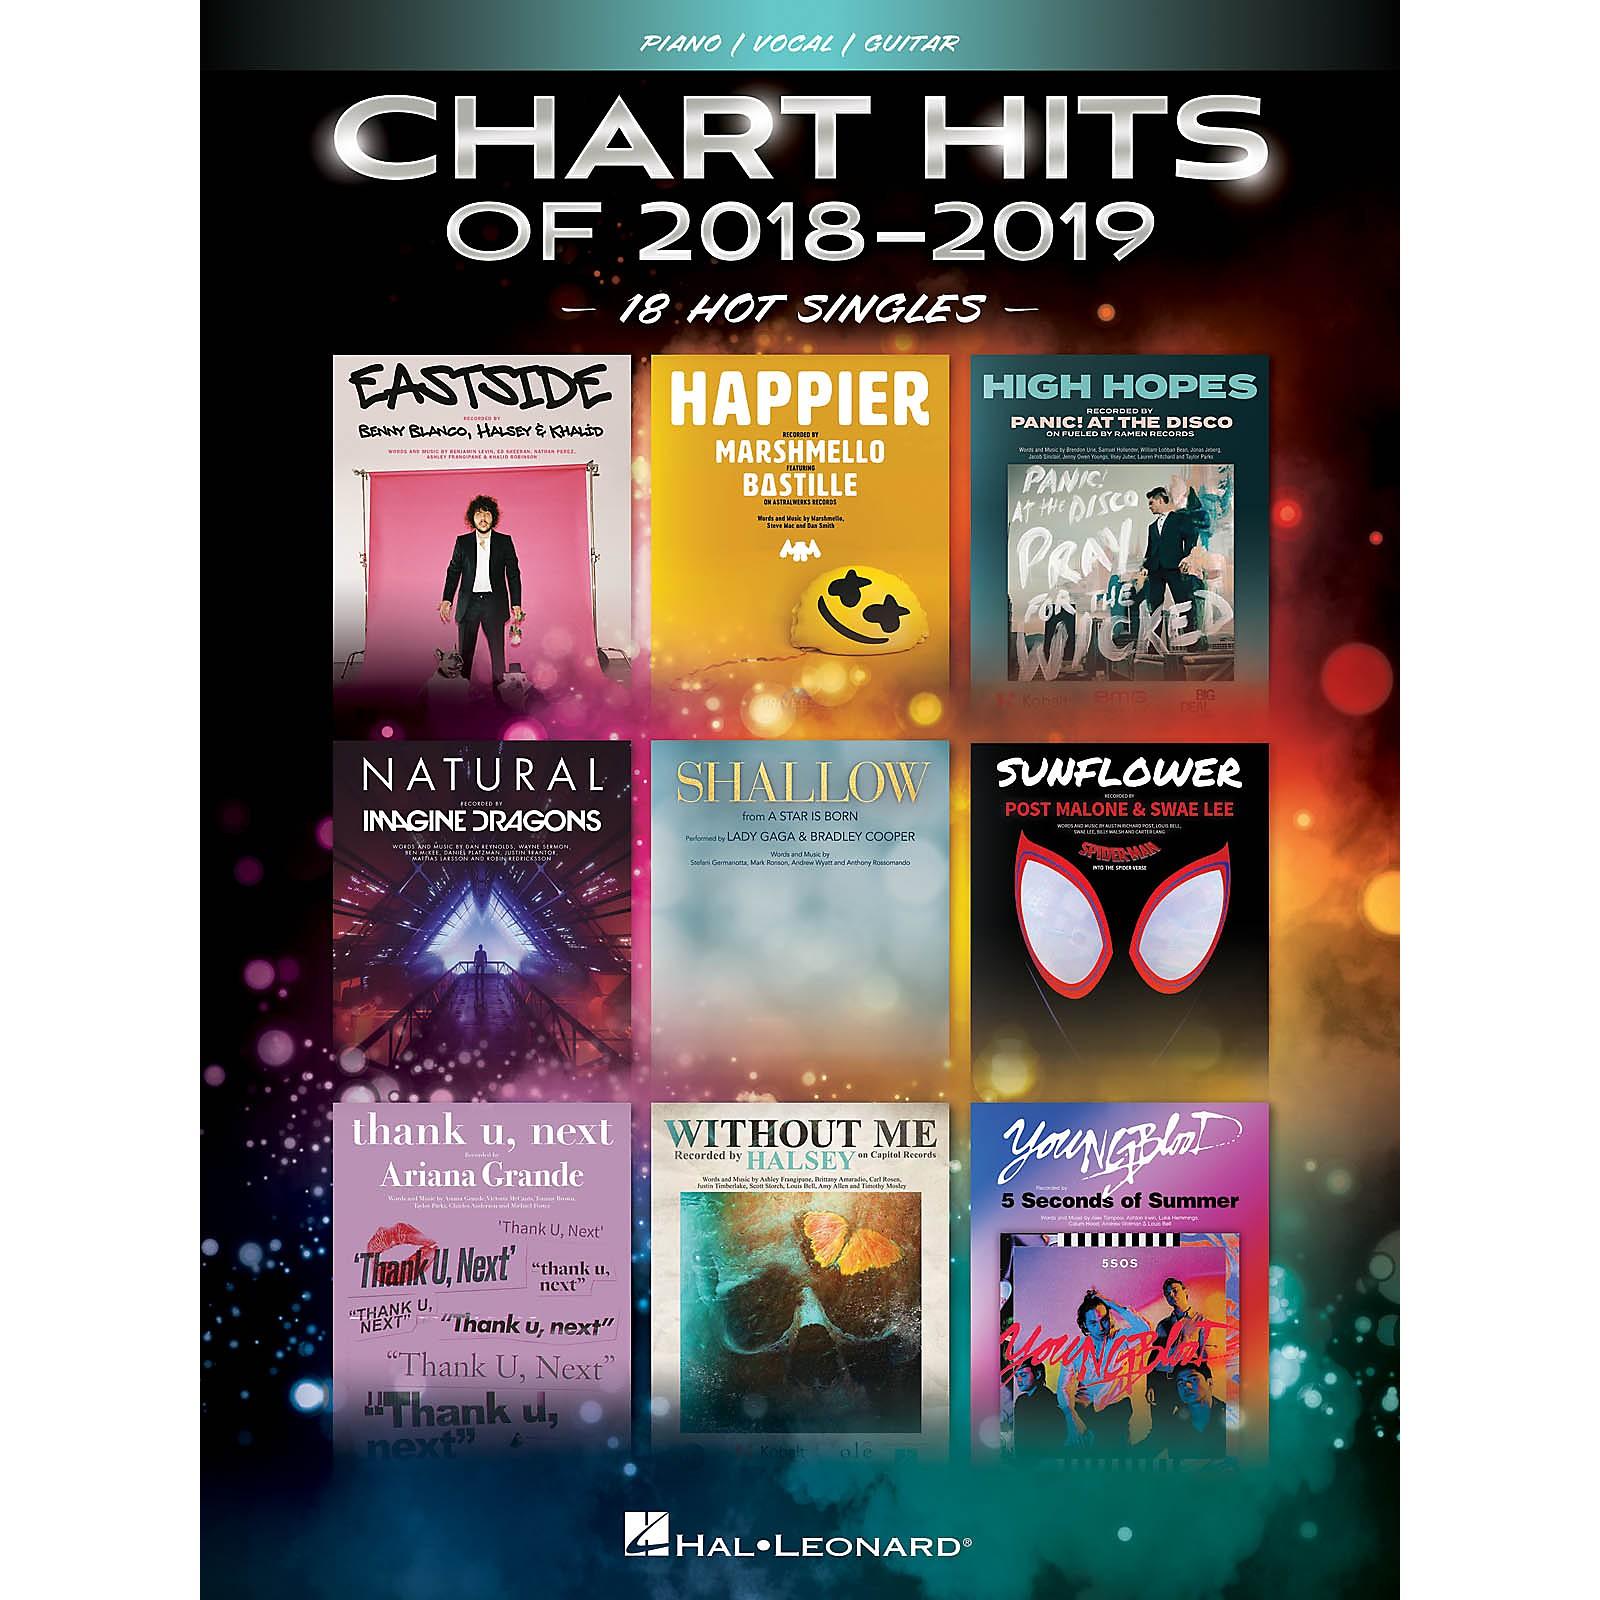 Hal Leonard Chart Hits of 2018-2019 (18 Hot Singles) Piano/Vocal/Guitar Songbook